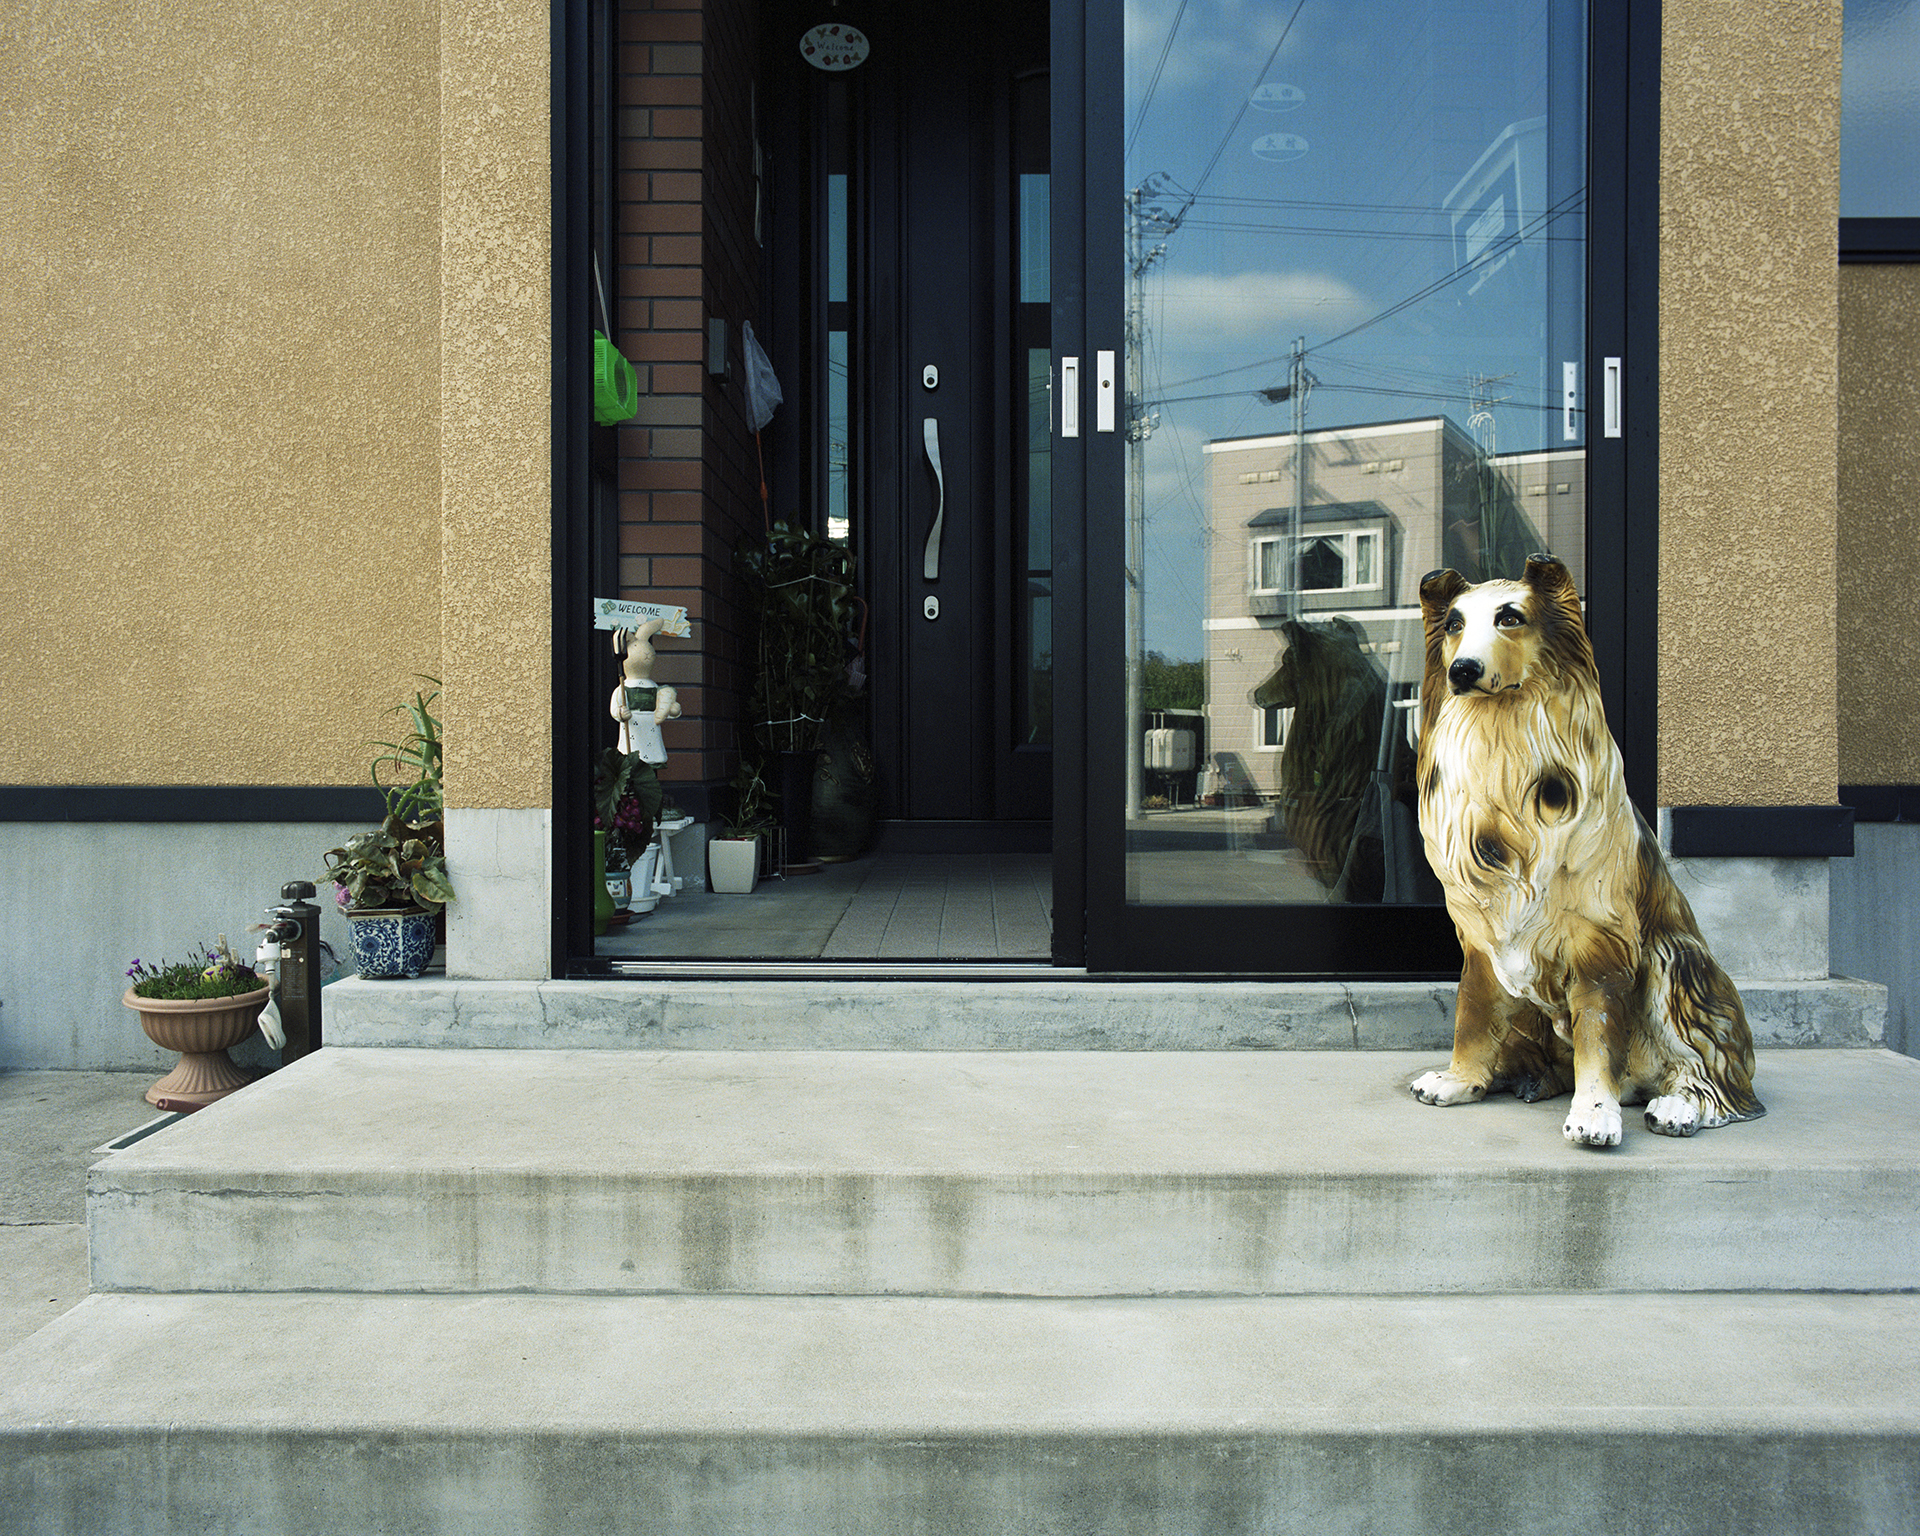 Aomori, A warm welcome.